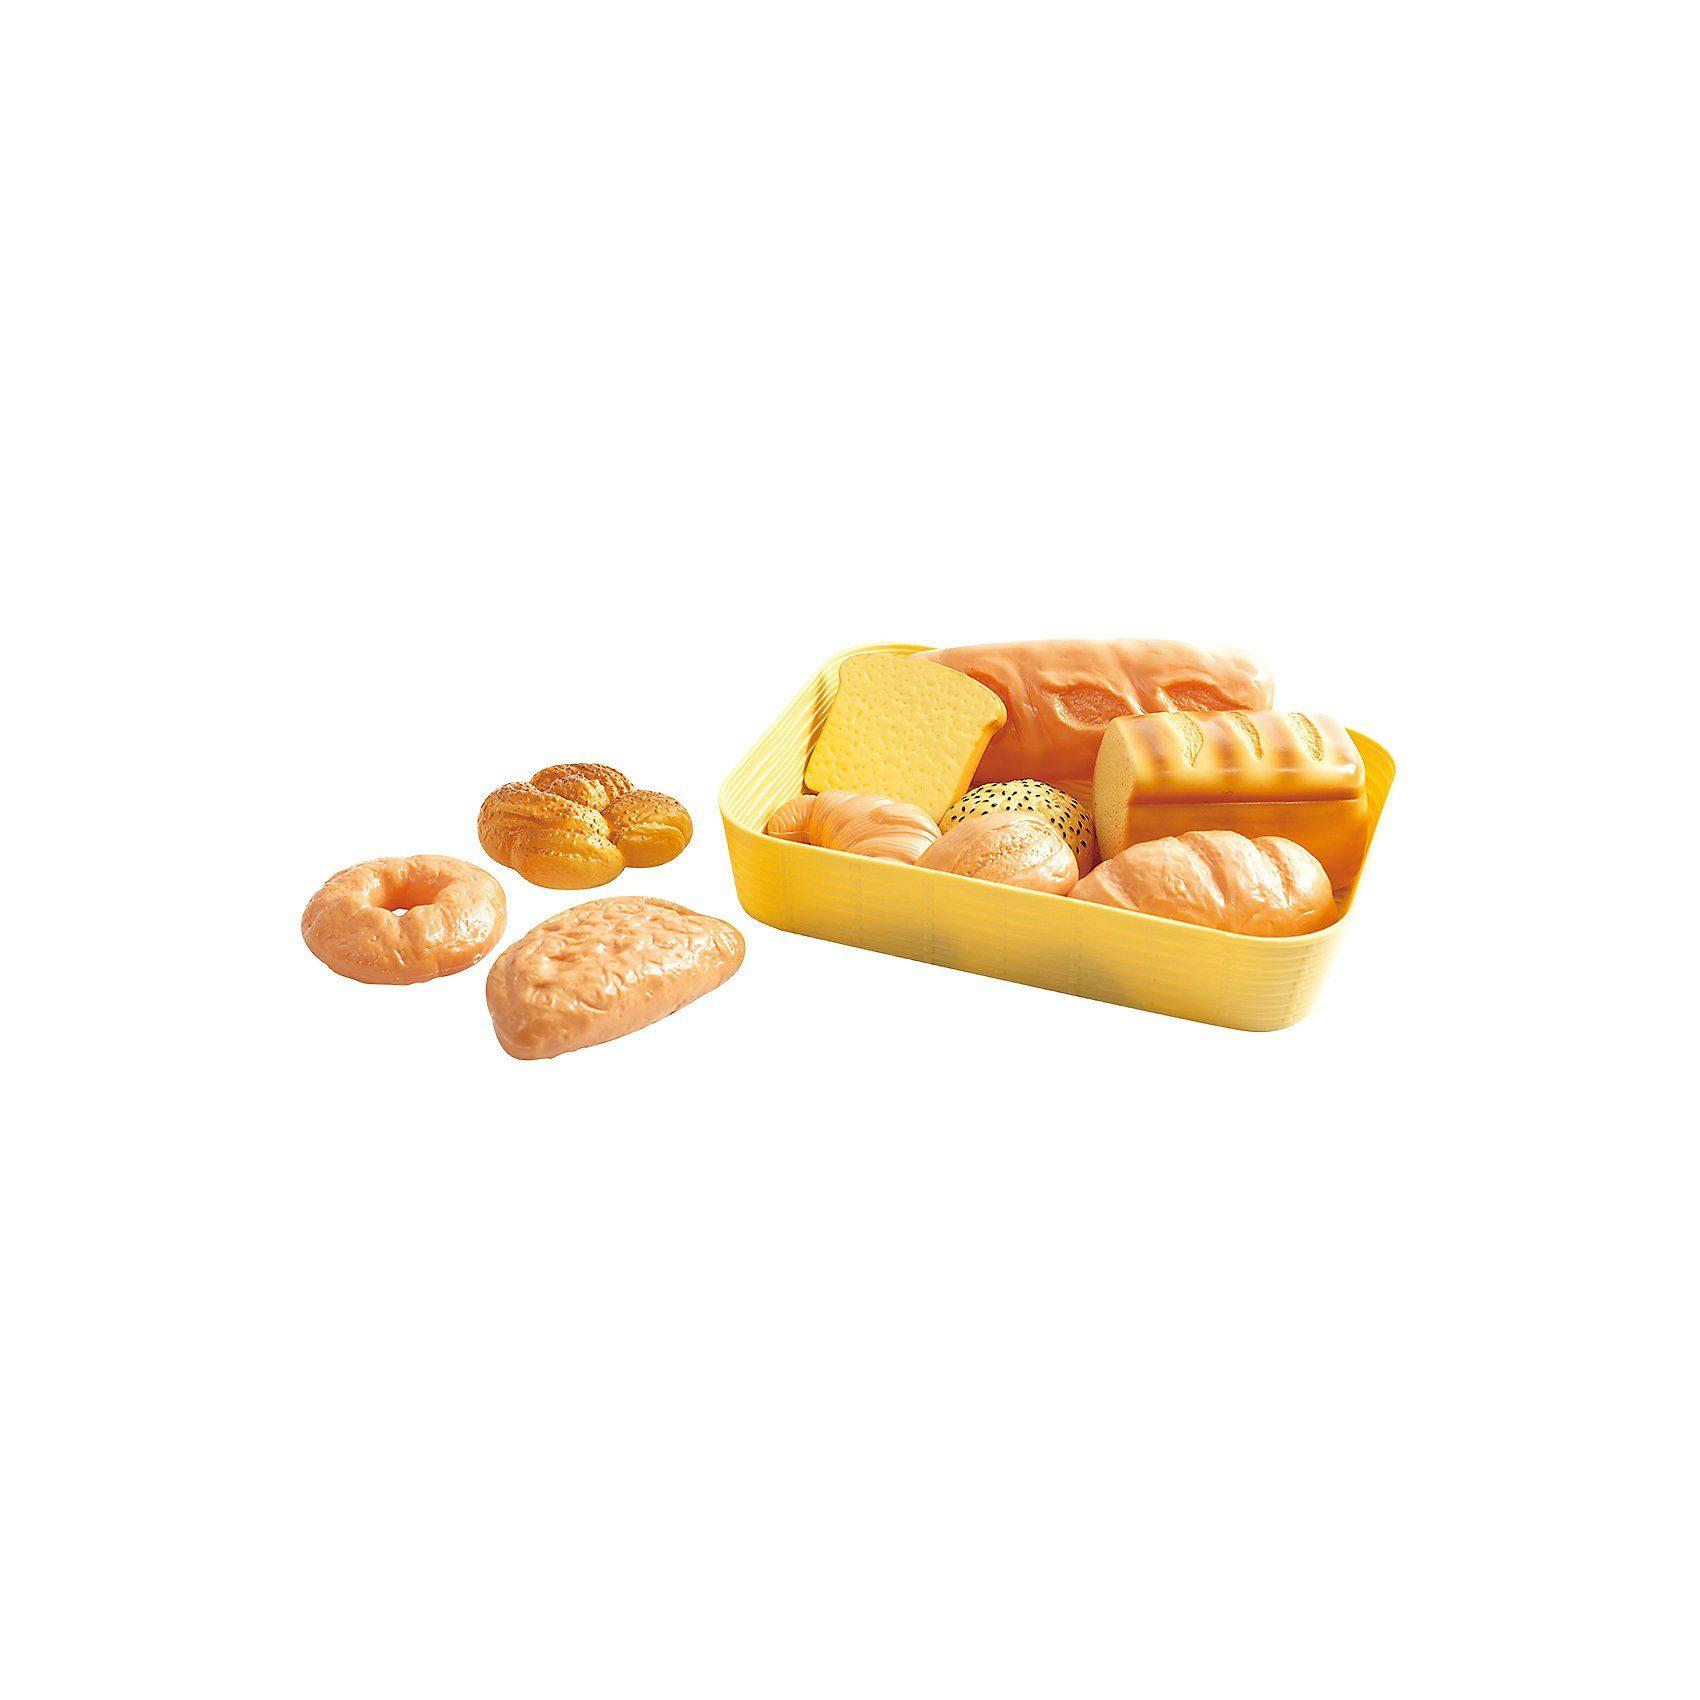 Playgo Spiellebensmittel Brot-set